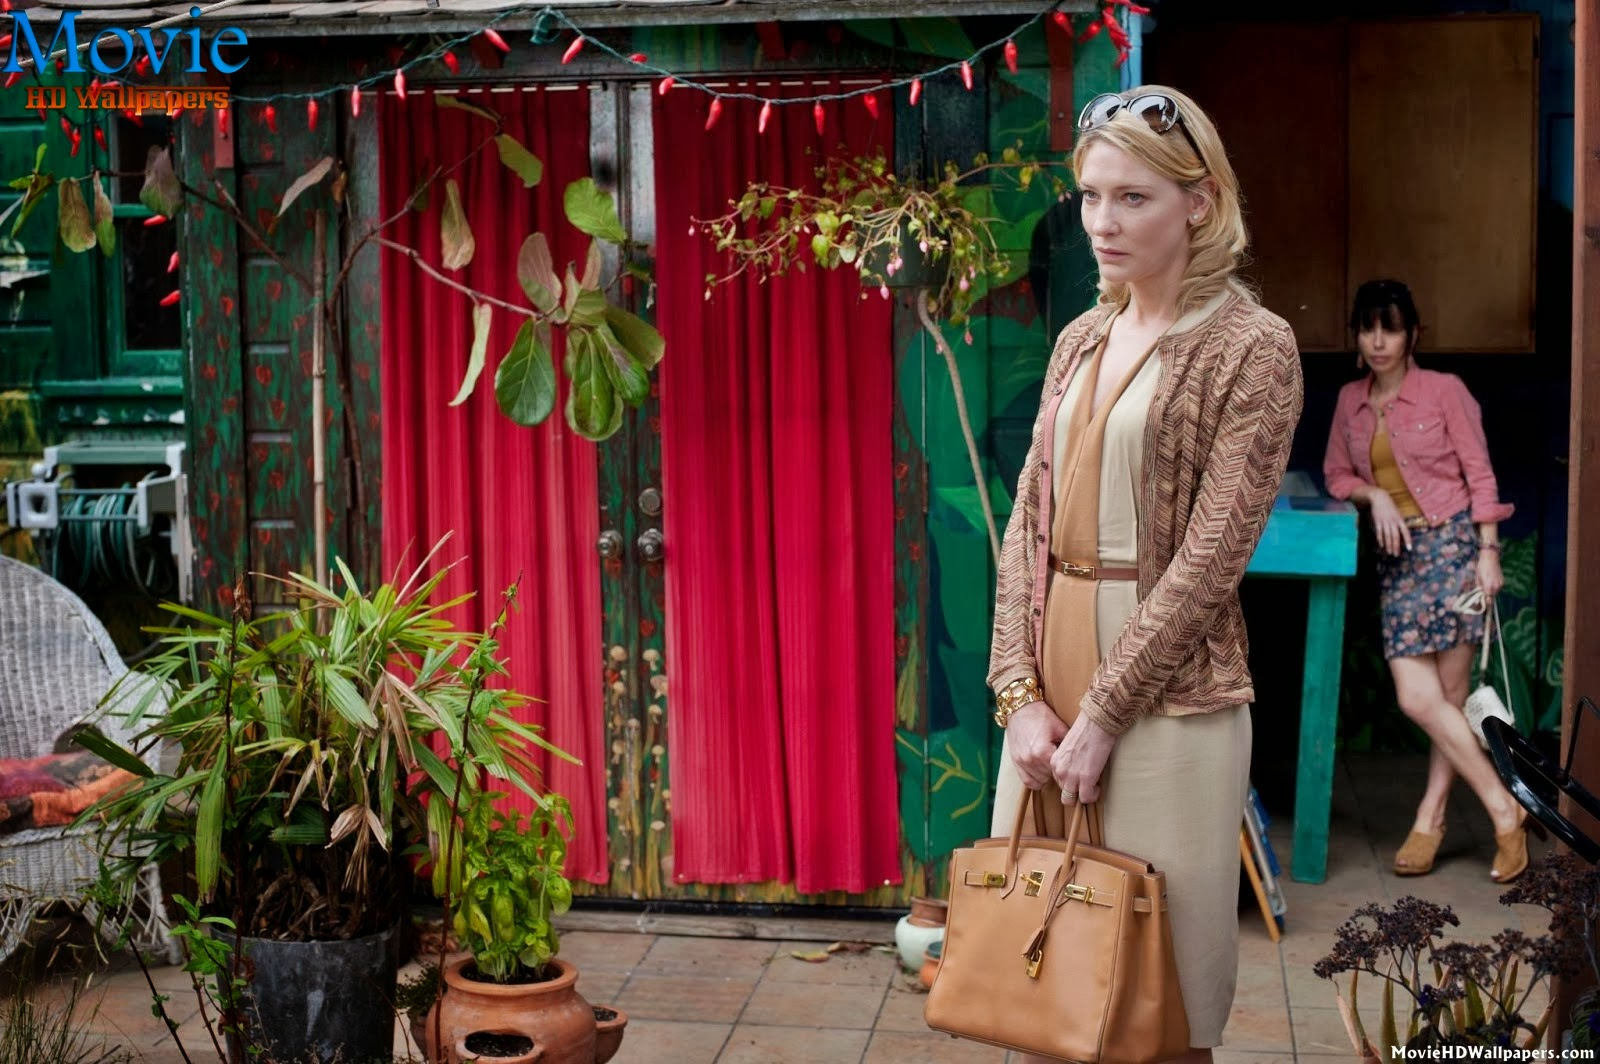 Blue Jasmine - Cate Blanchett takes the lead in my Oscar Race